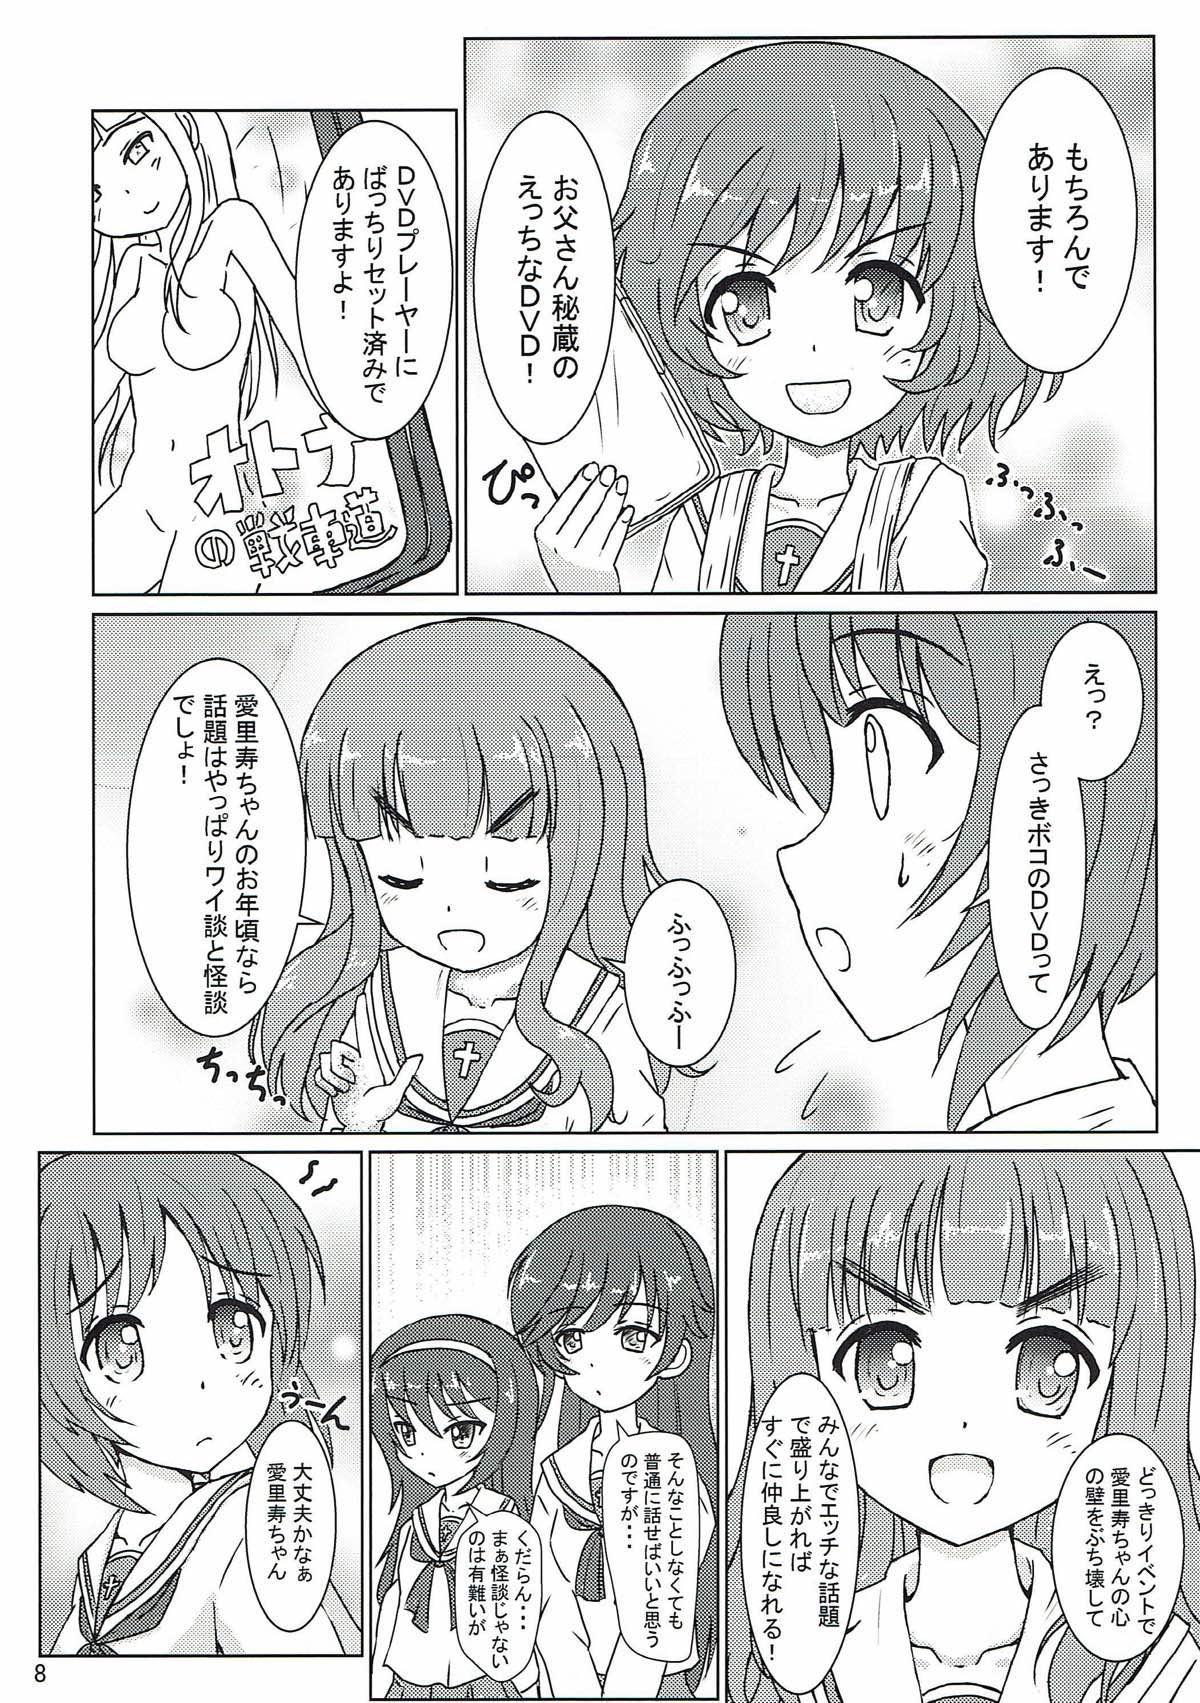 Totsugeki! Mousou Senshadou 5